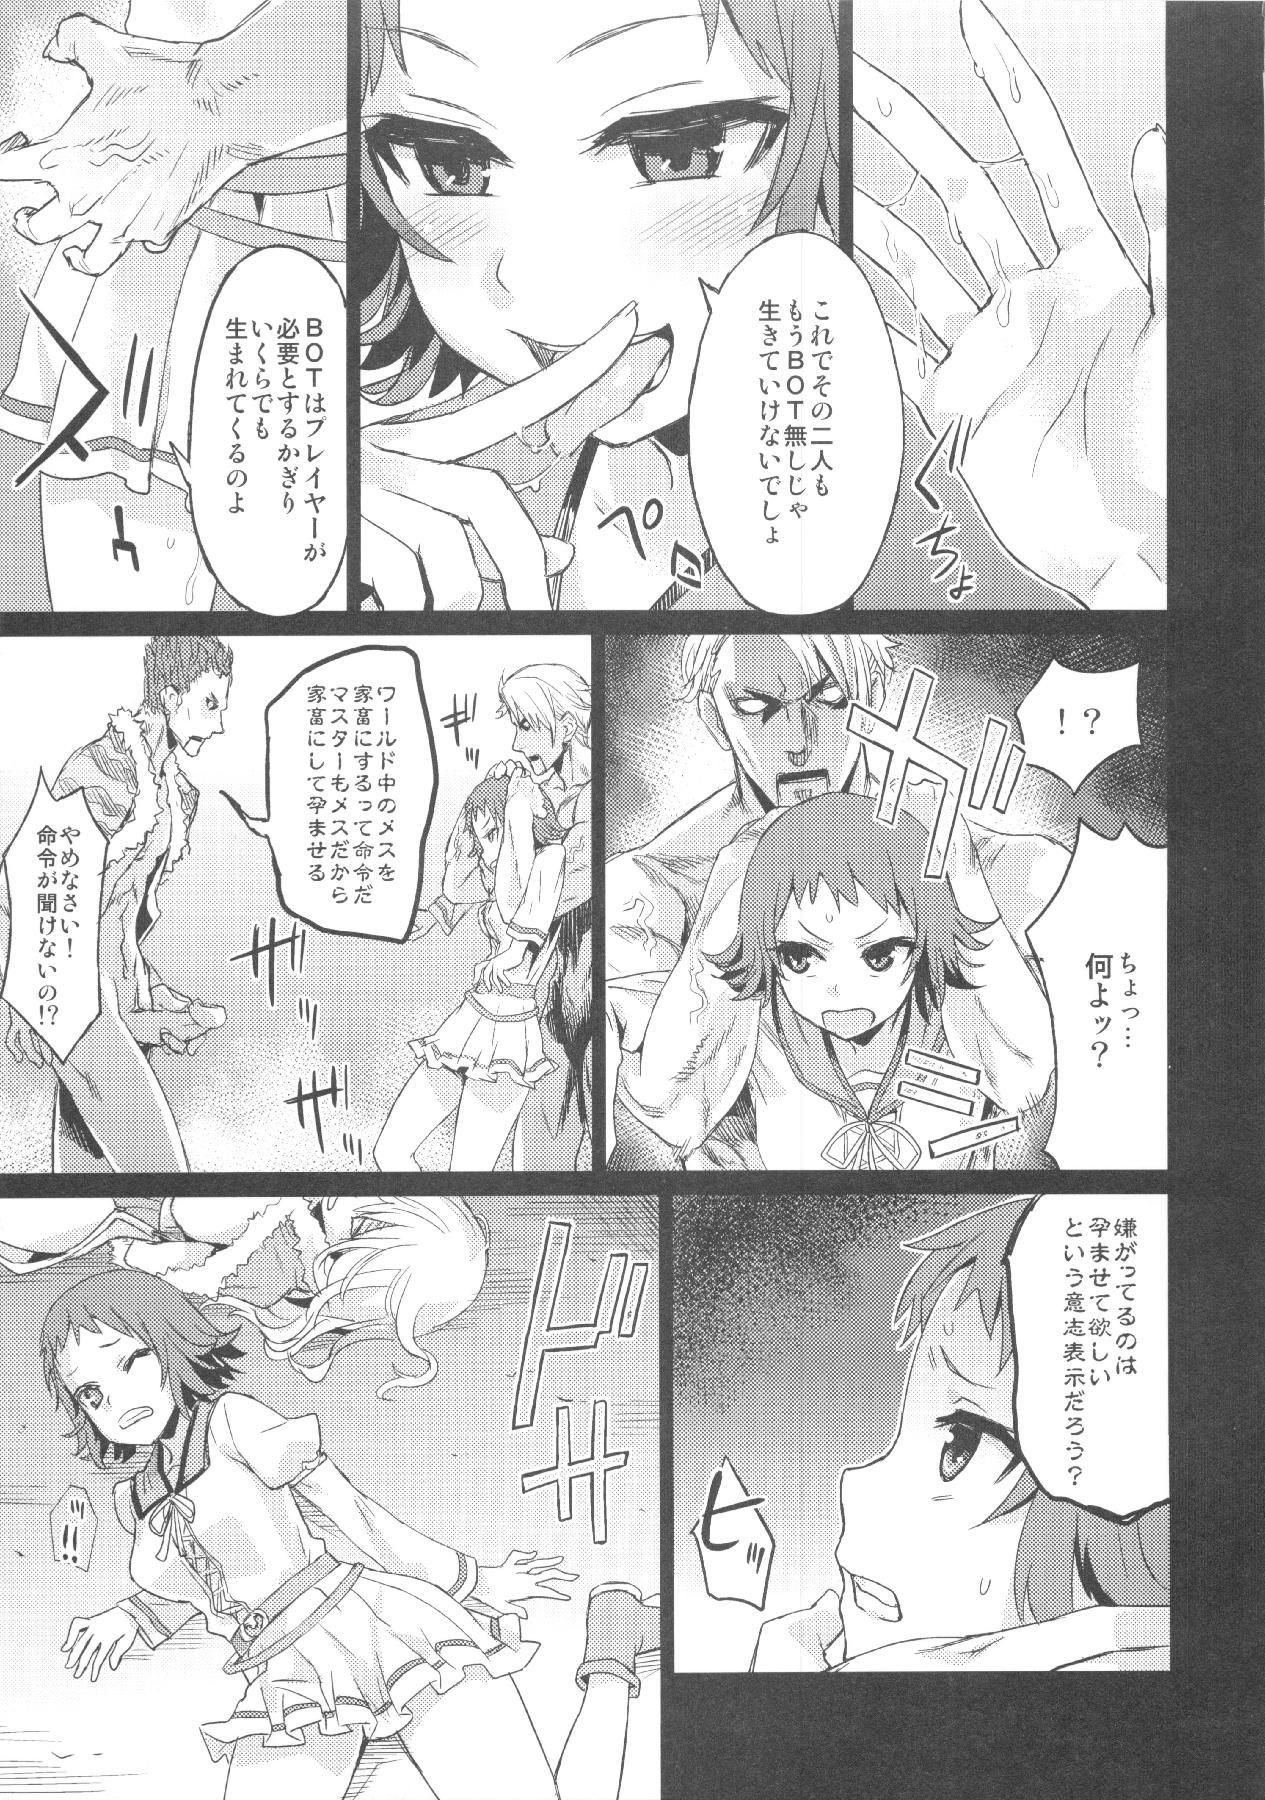 (C83) [Fatalpulse (Asanagi)] VictimGirls Compiled Vol.1 -Victimgirls Soushuuhen 1- MMO Game Selection (Various) 45